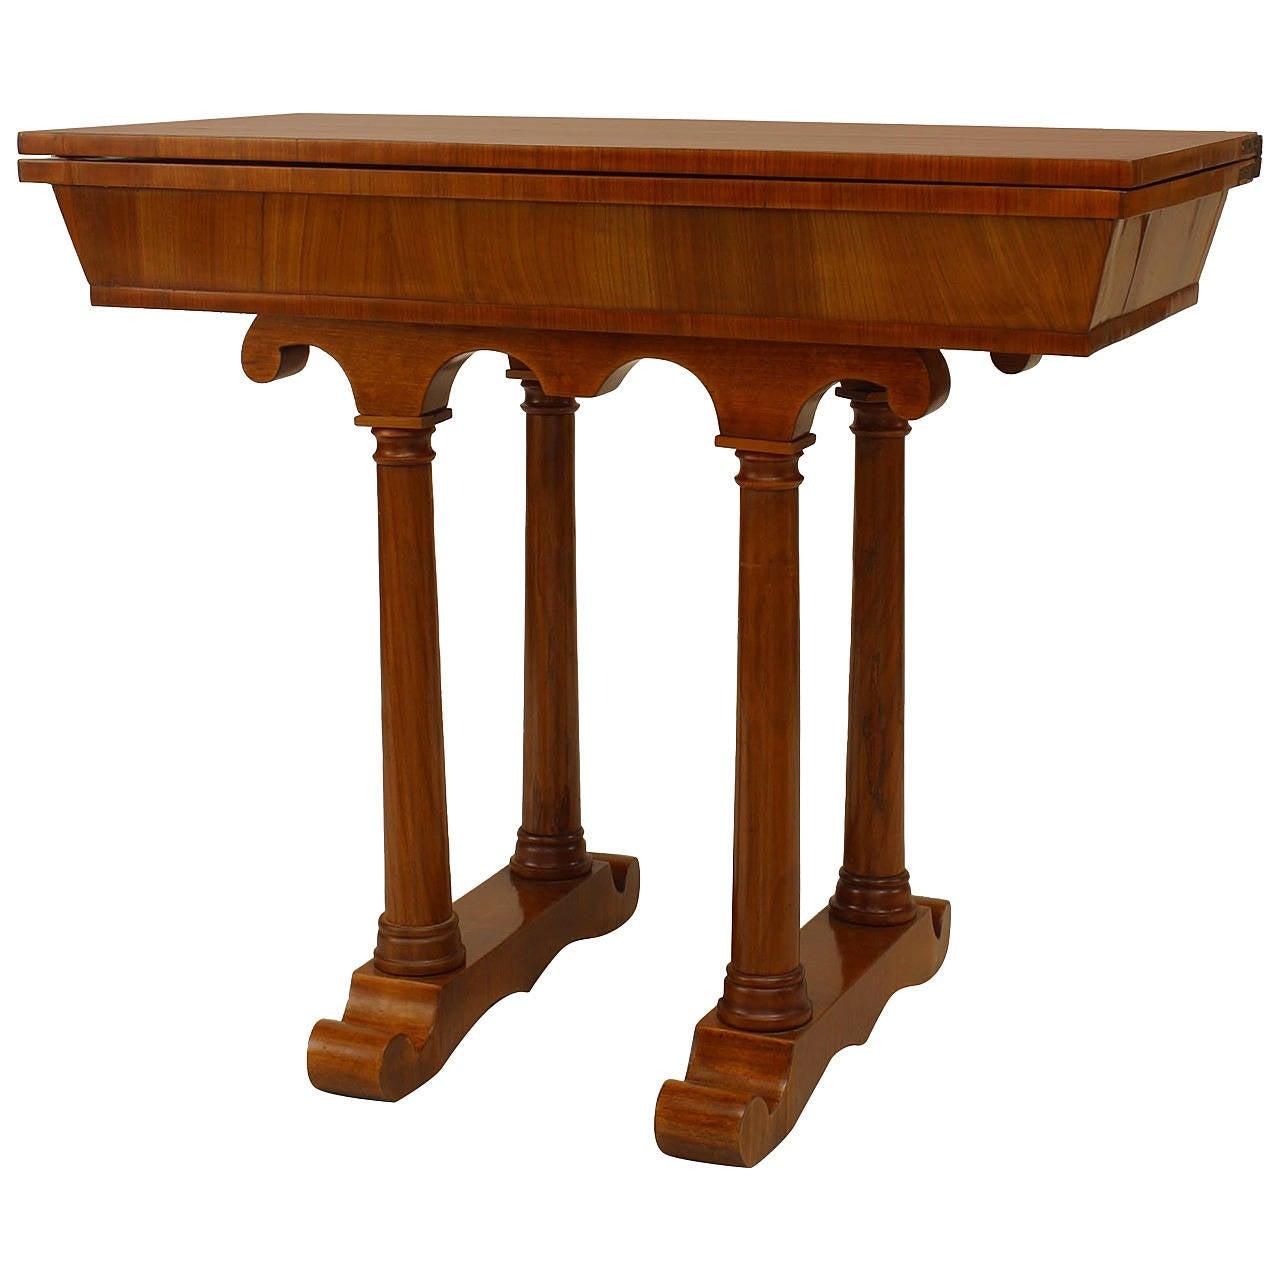 Early 19th Century Austrian Biedermeier Cherrywood Console Game Table